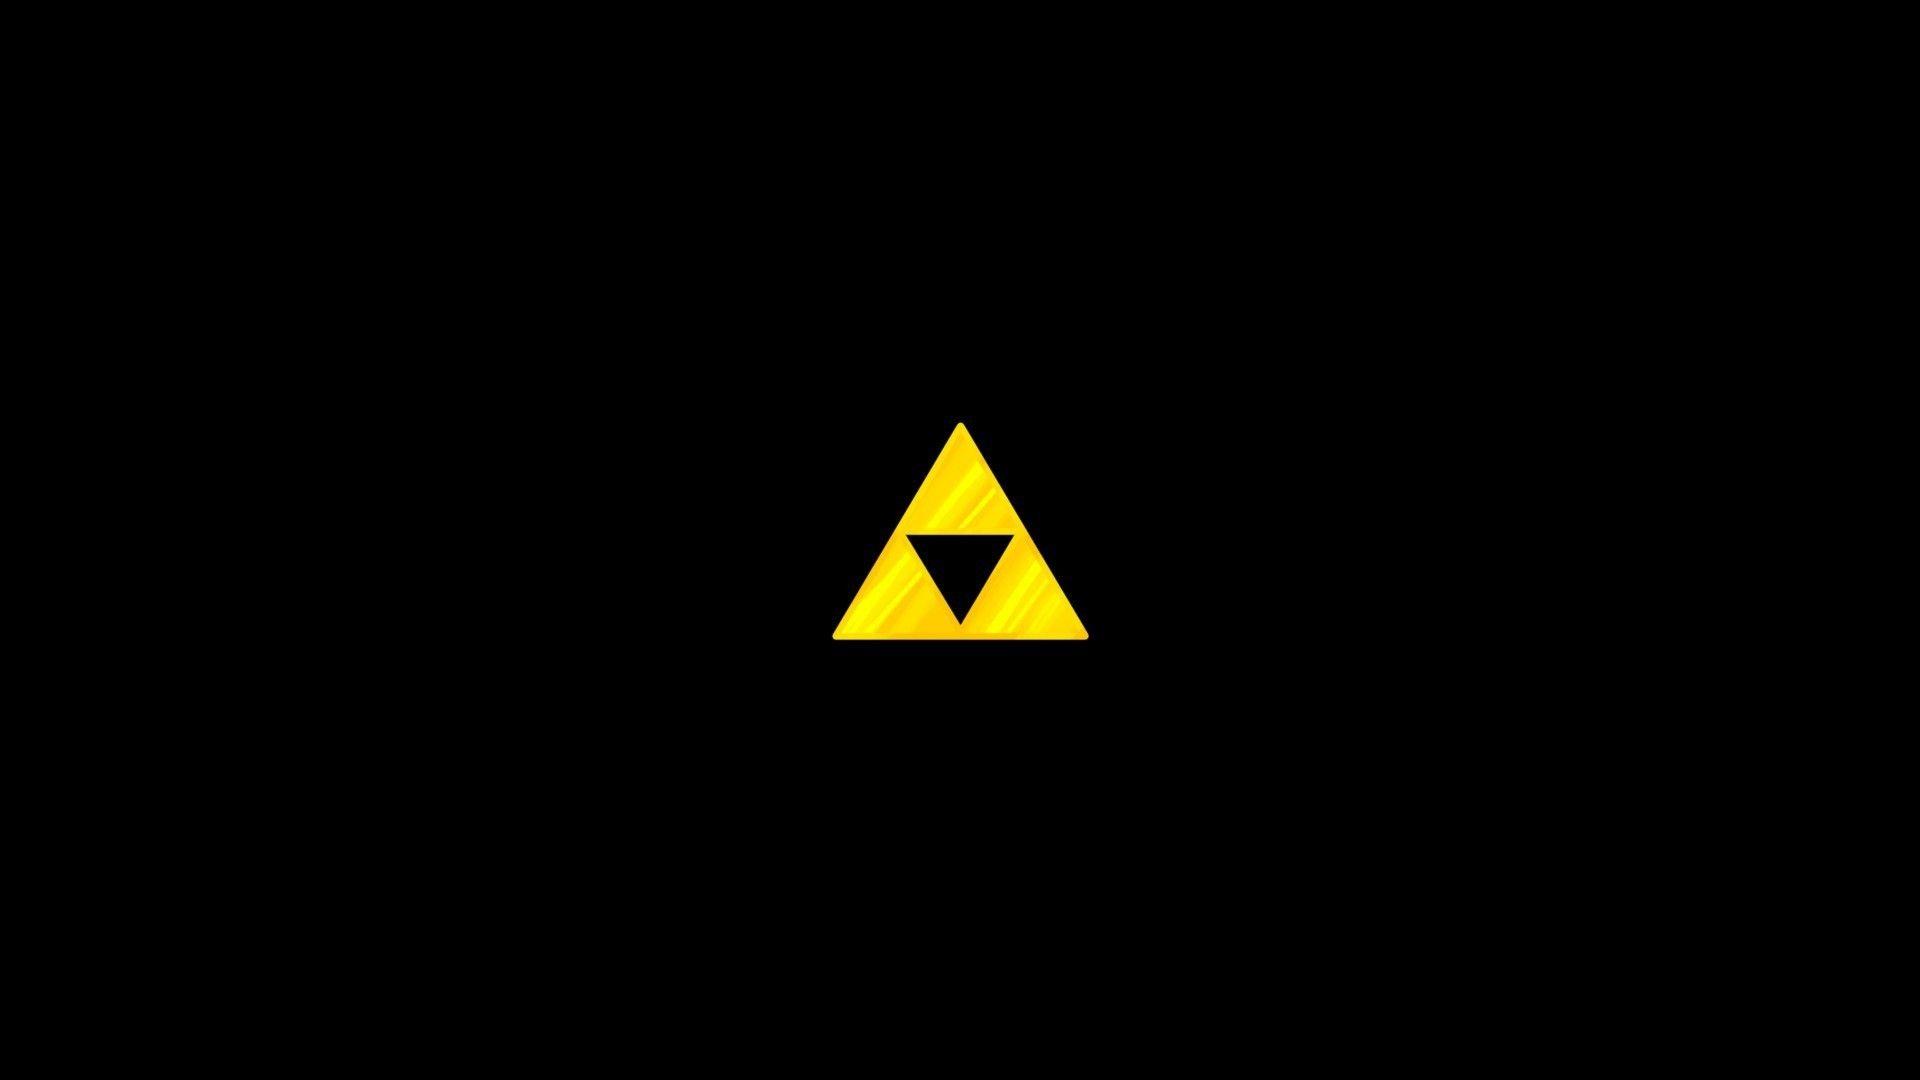 The Legend Of Zelda Black Background Simple Triforce Wallpaper Black Backgrounds Background Images Hd Legend Of Zelda